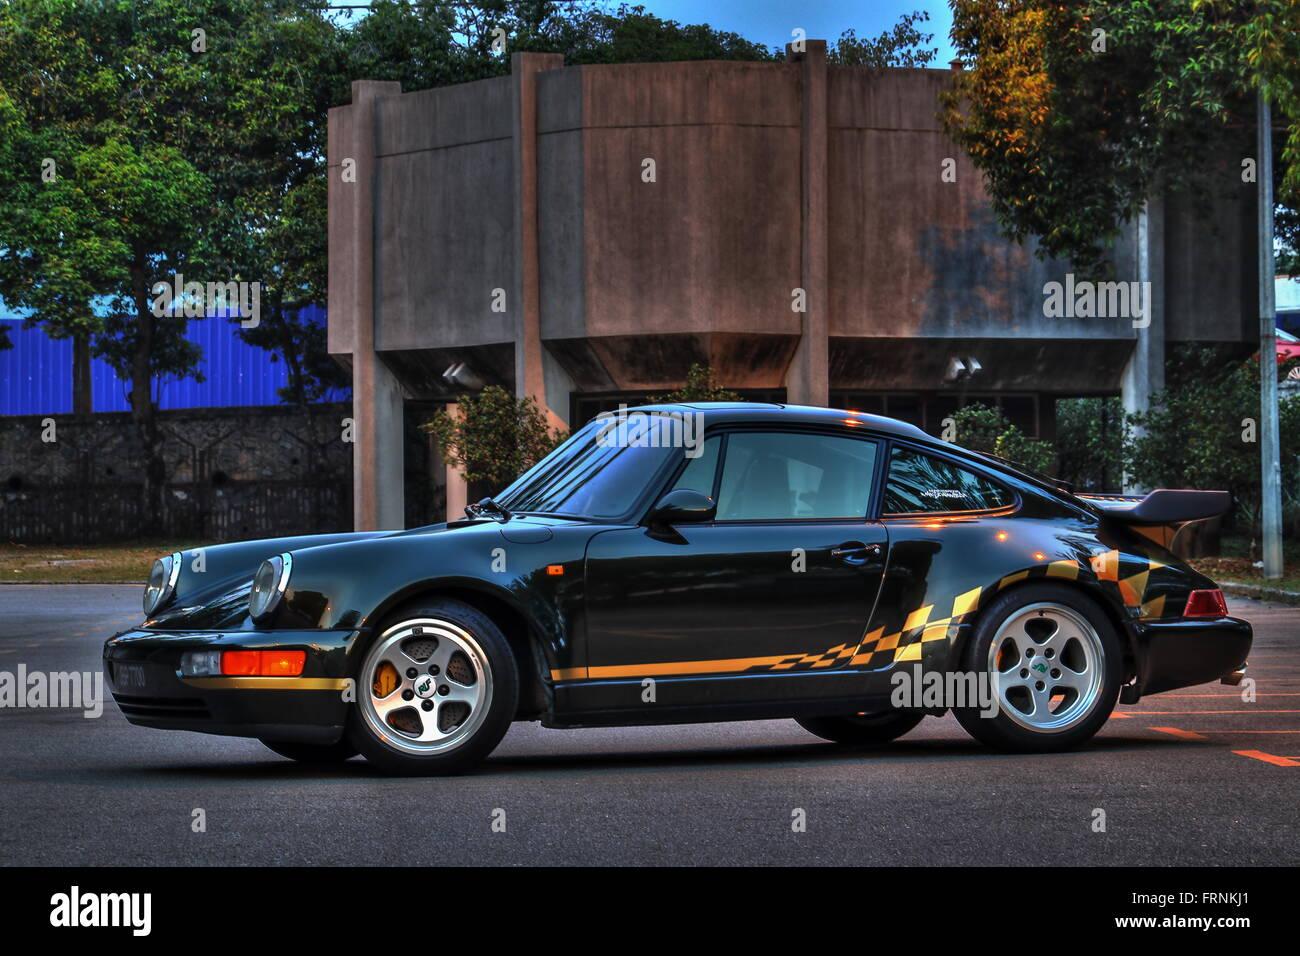 Porsche 911 Turbo - Twilight Stock Photo